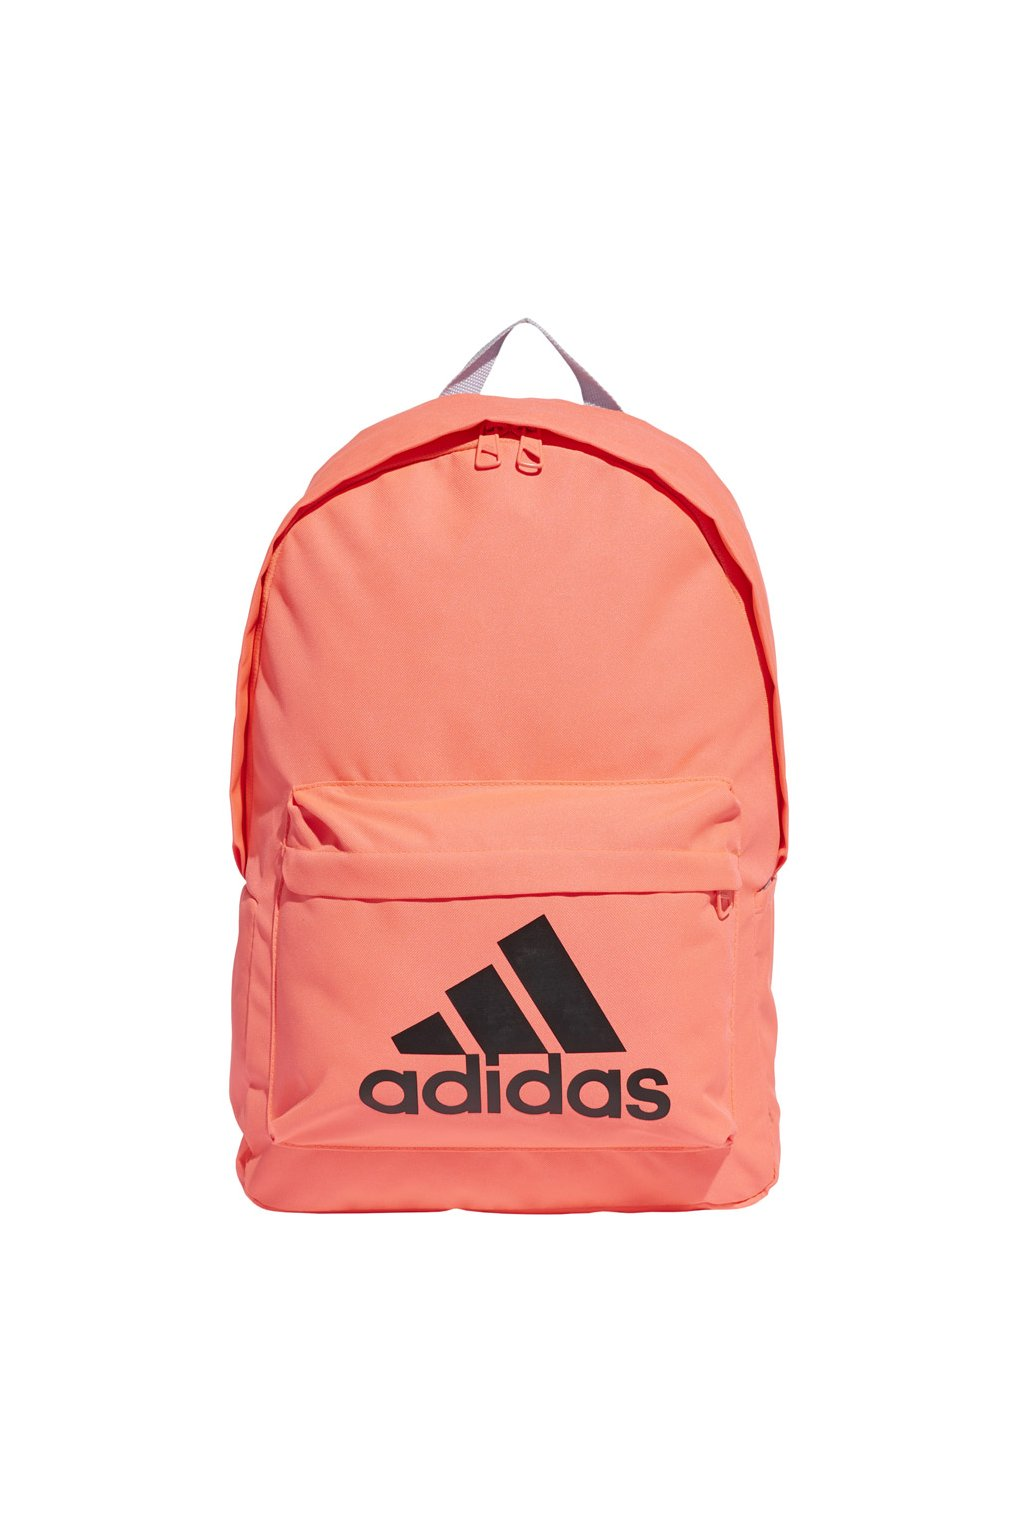 Batoh adidas Classic BP Bos ružový FT8763